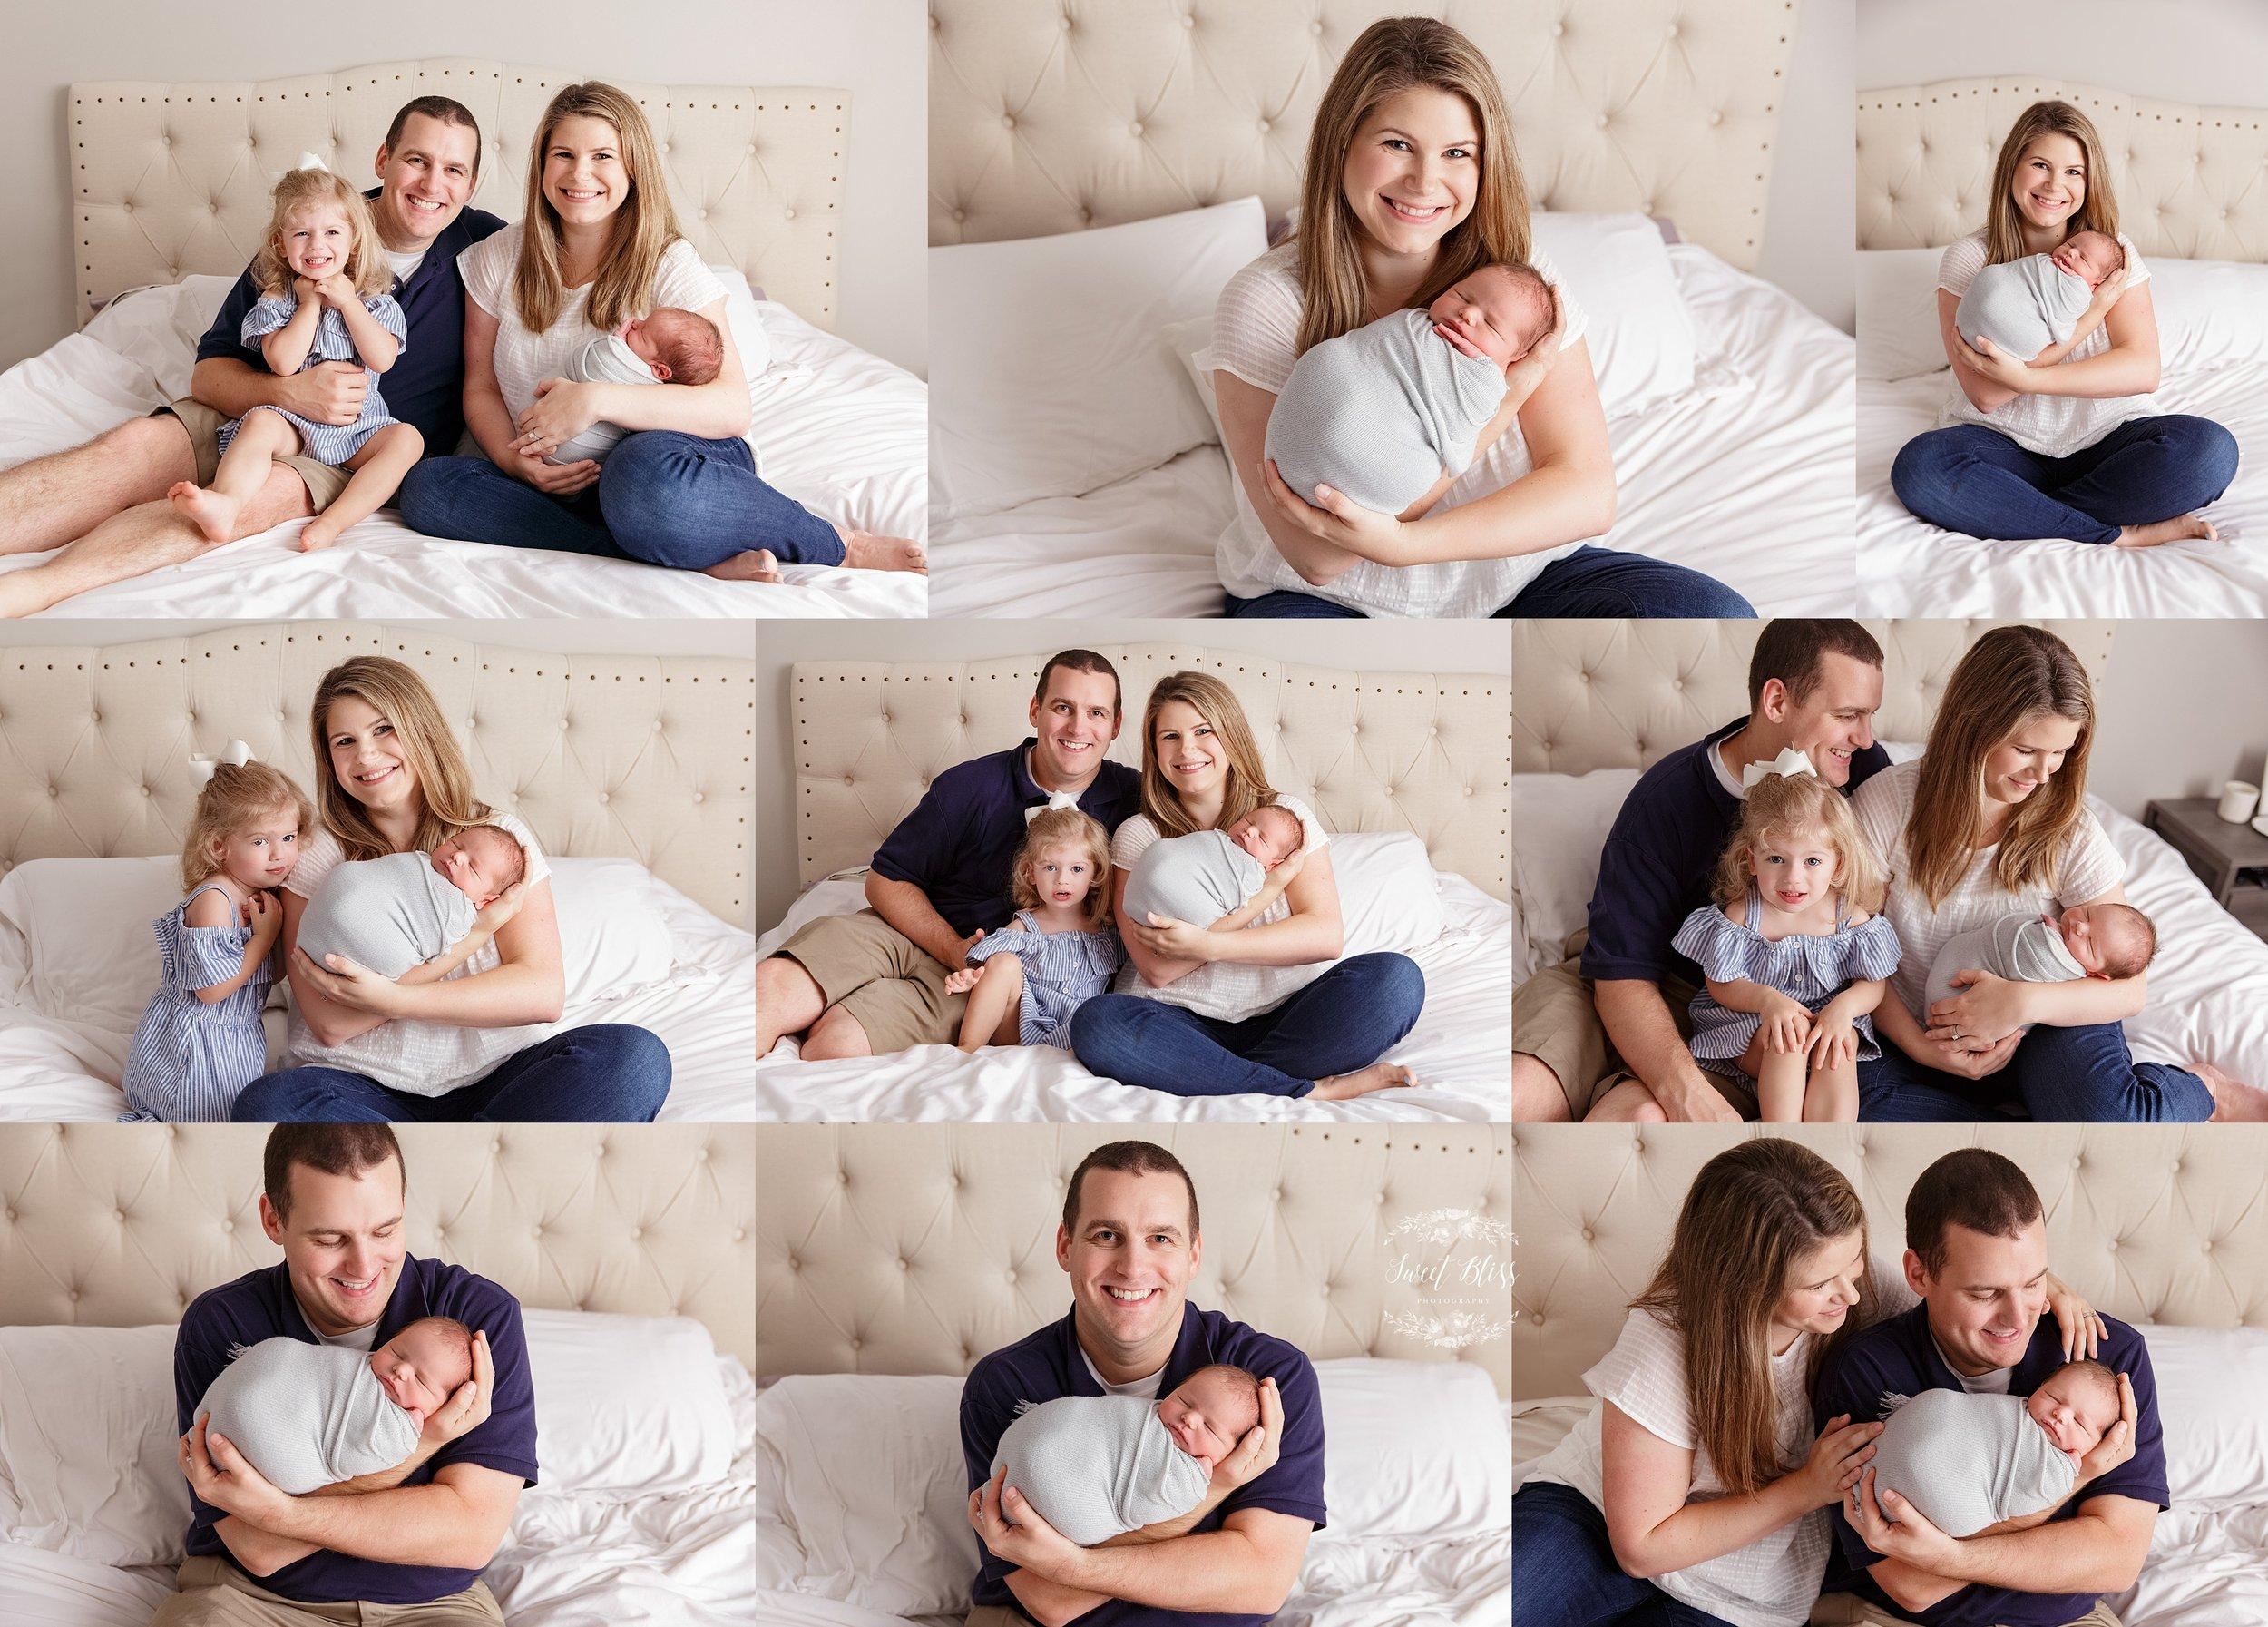 sweetblissphotography_family1_newbornboy1.jpg